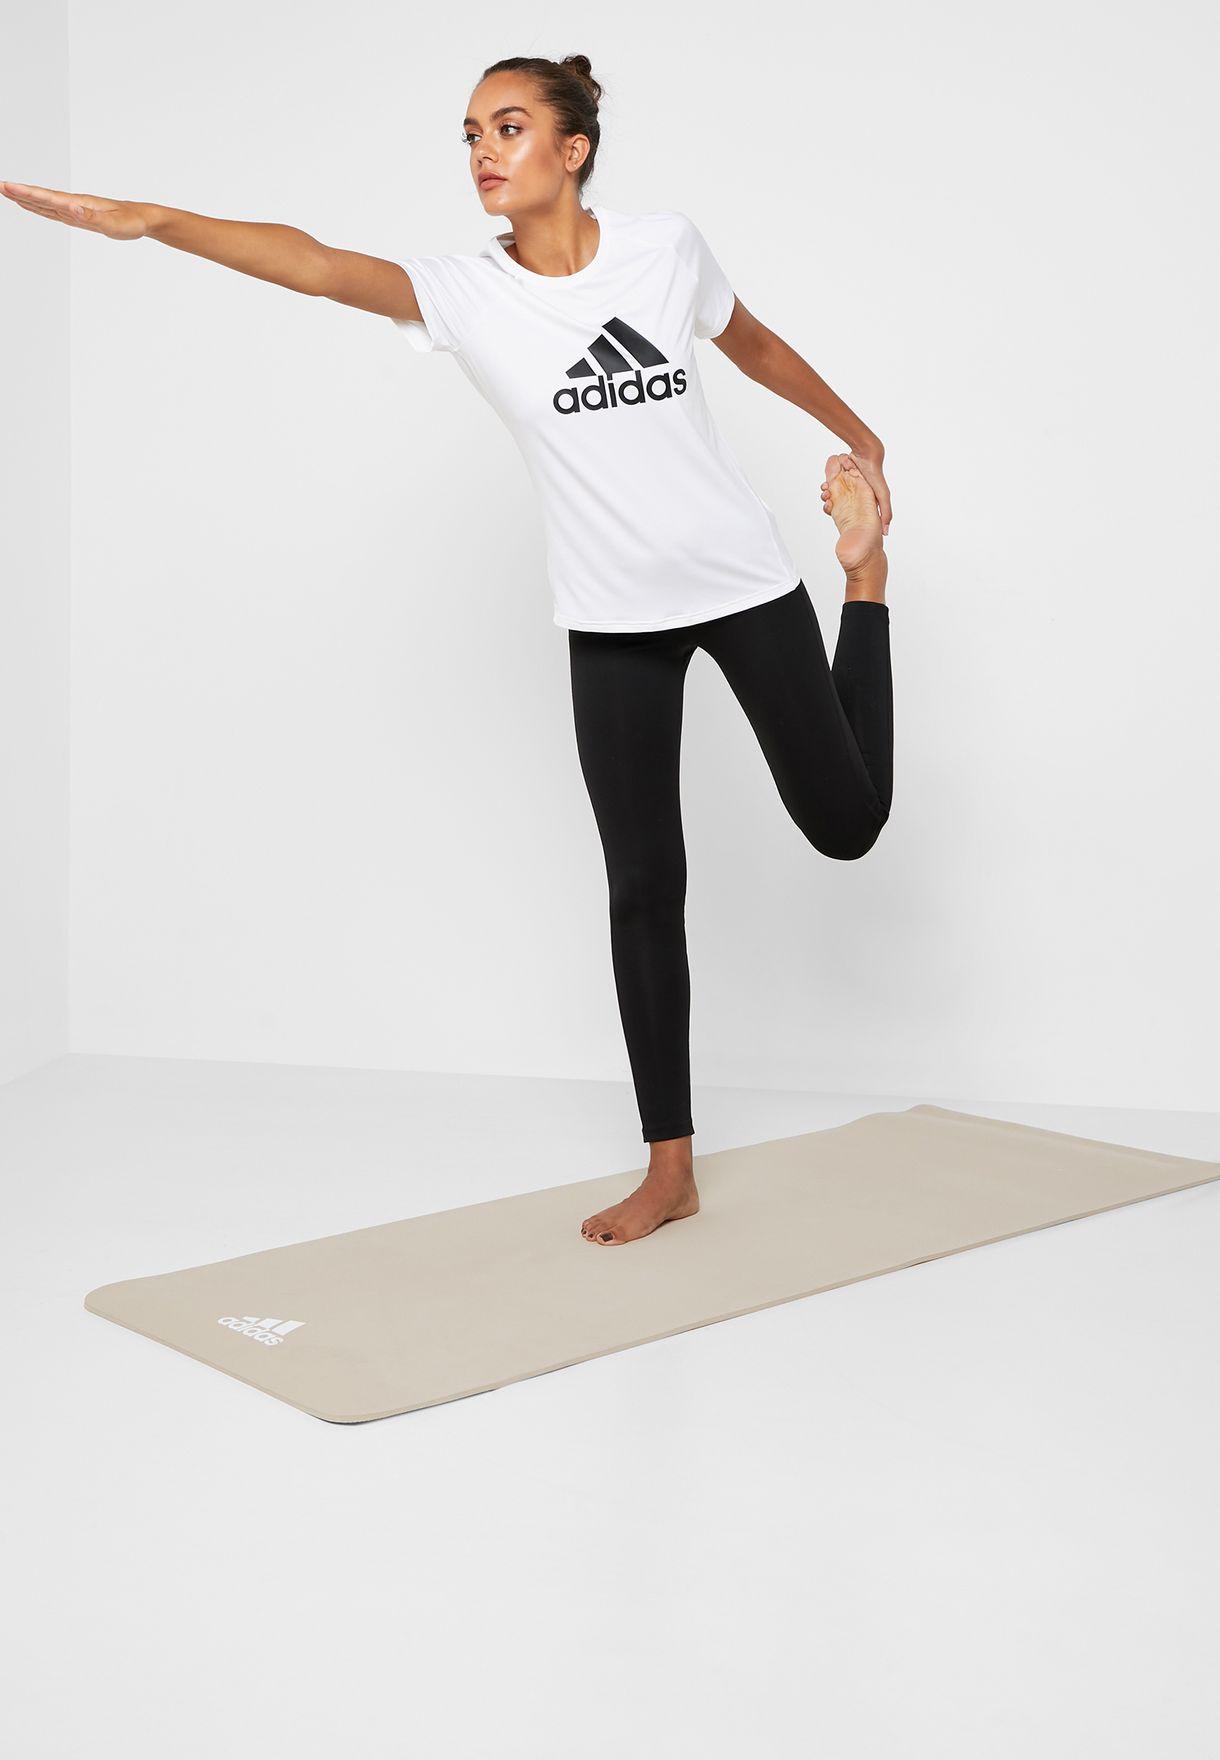 Buy Adidas Grey Yoga Mat 8mm For Women In Mena Worldwide Globally 14448ac61zkp